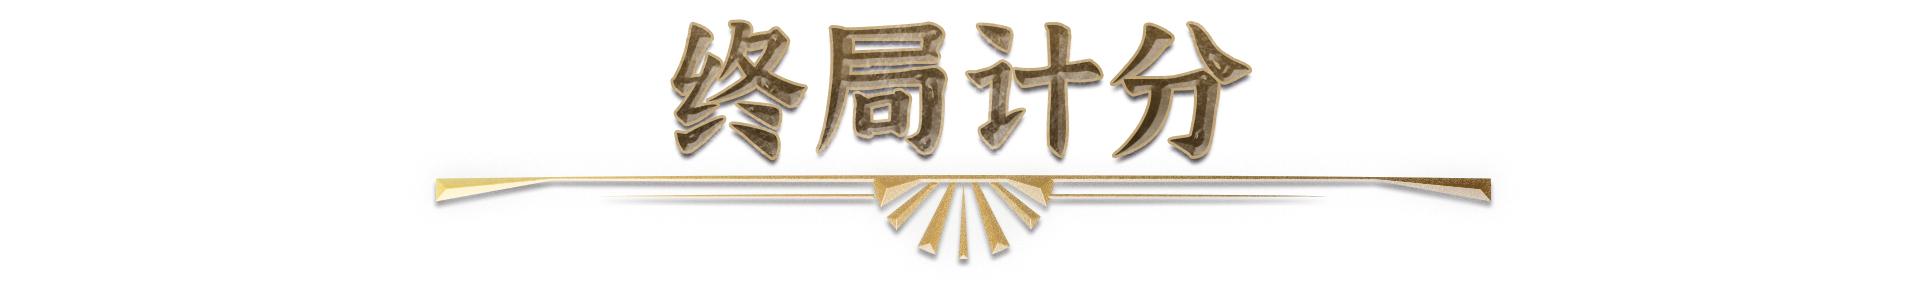 titre2-ks-终局计分.jpg